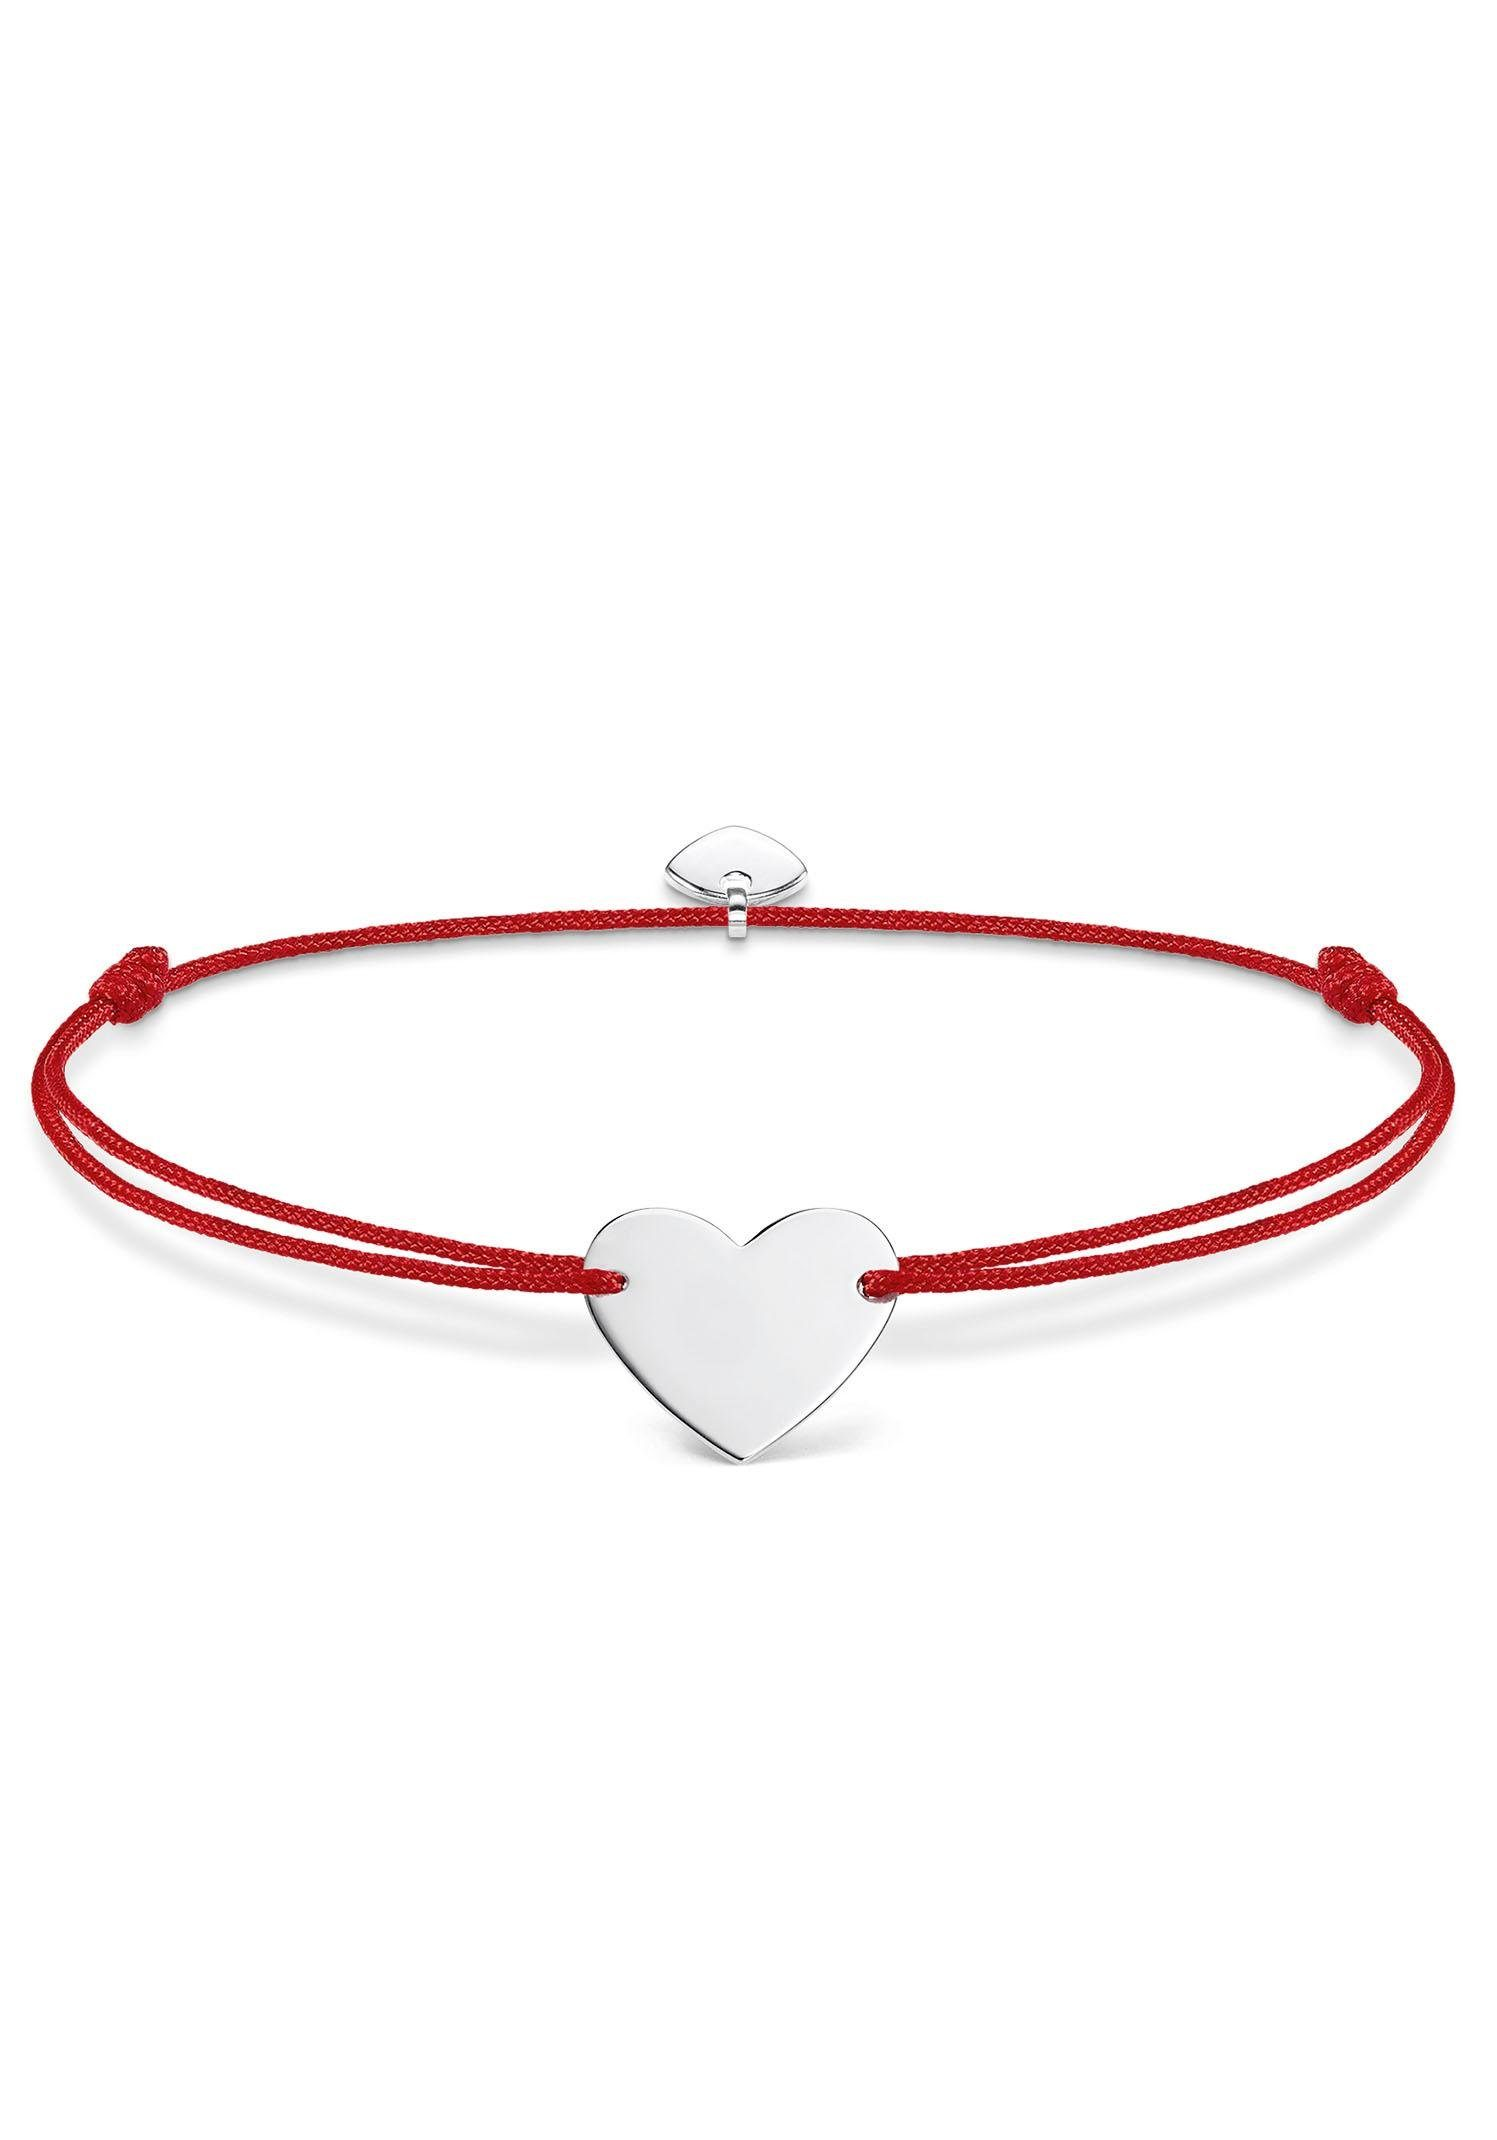 THOMAS SABO Armband »Herz, Little Secret, LS006-173-10-L20v«